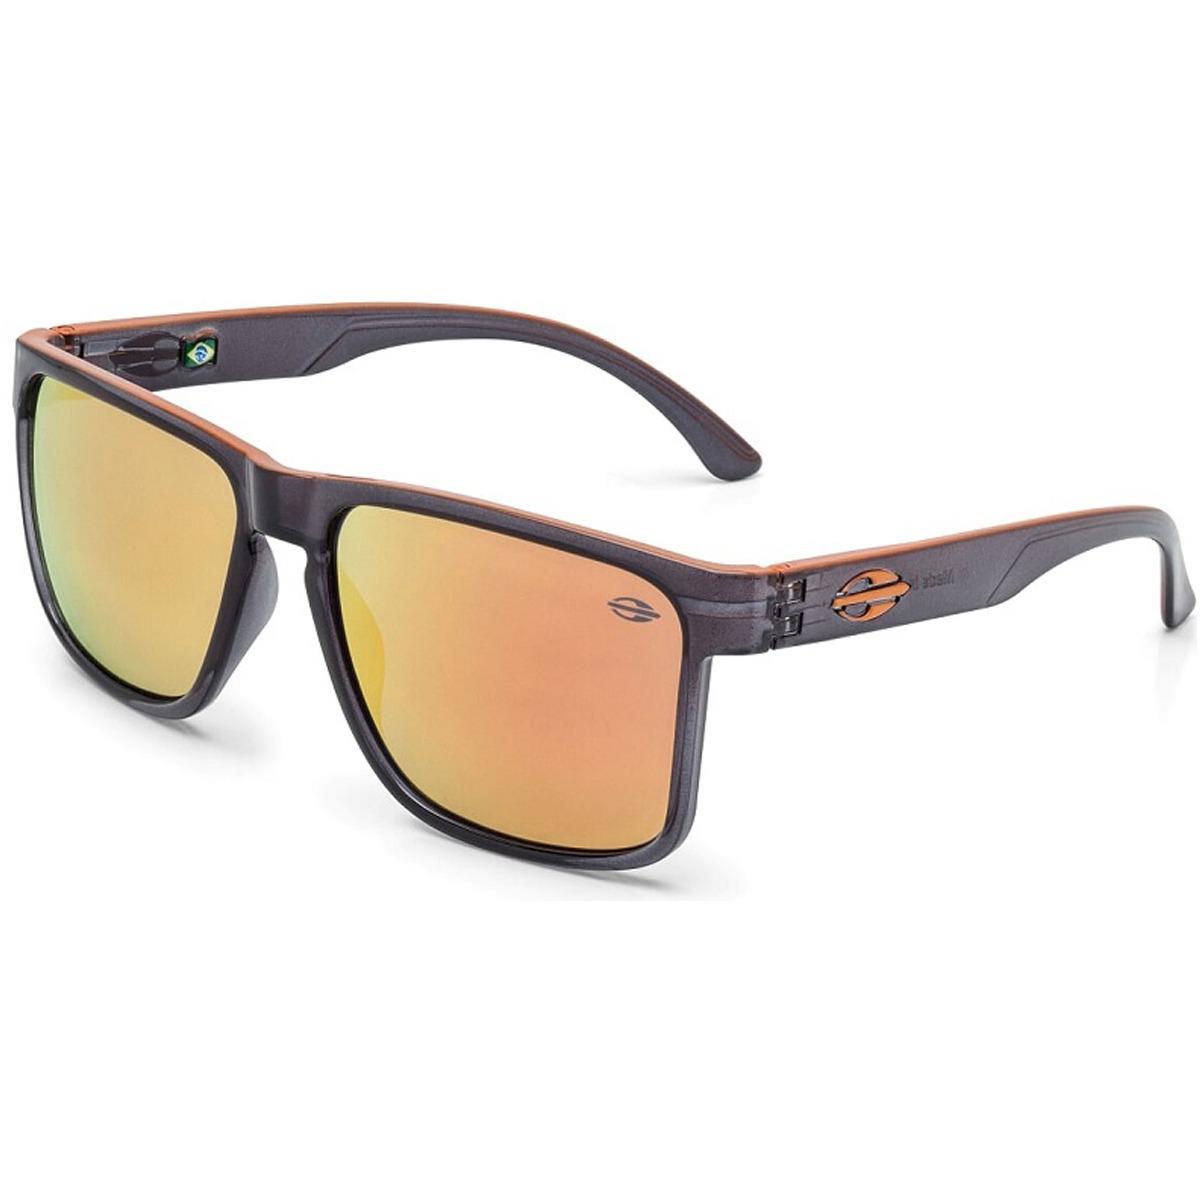 4faccc0770dd9 Óculos Mormaii Monterey Preto Fume lente Laranja - R  249,90 em ...